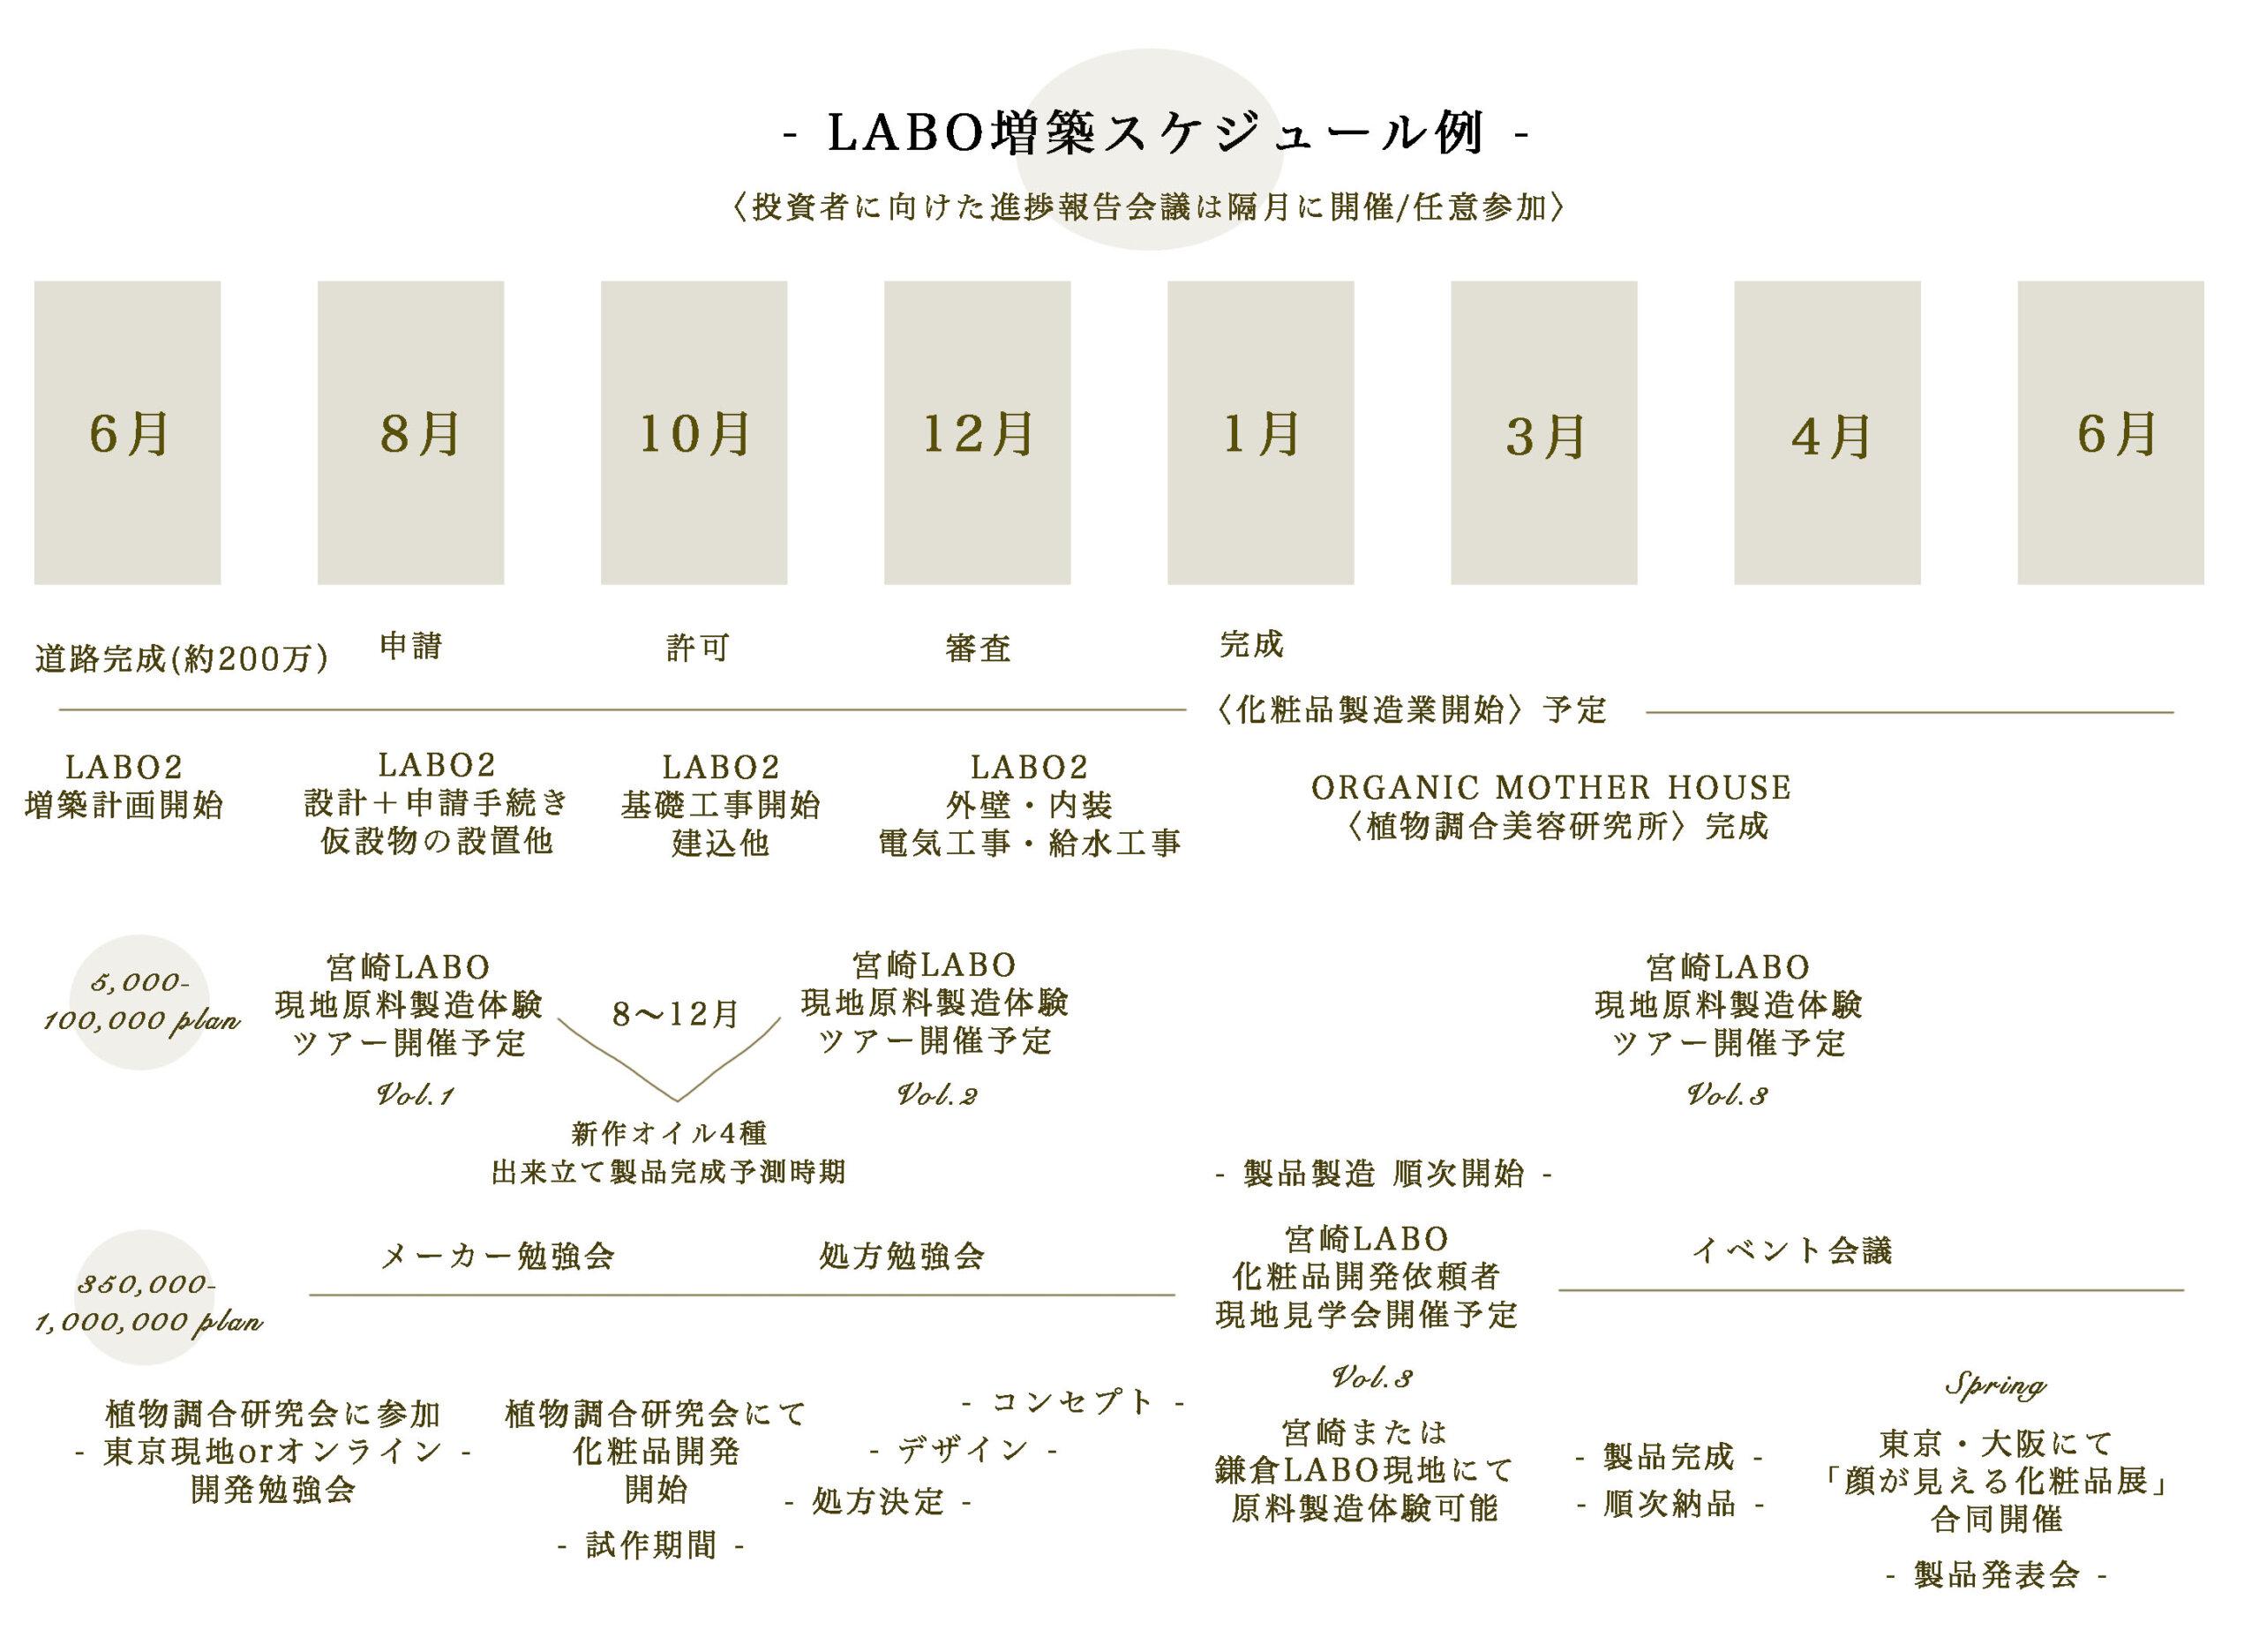 LABO増築スケジュール例ORGANIC MOTHER HOUSE〈植物調合美容研究所〉